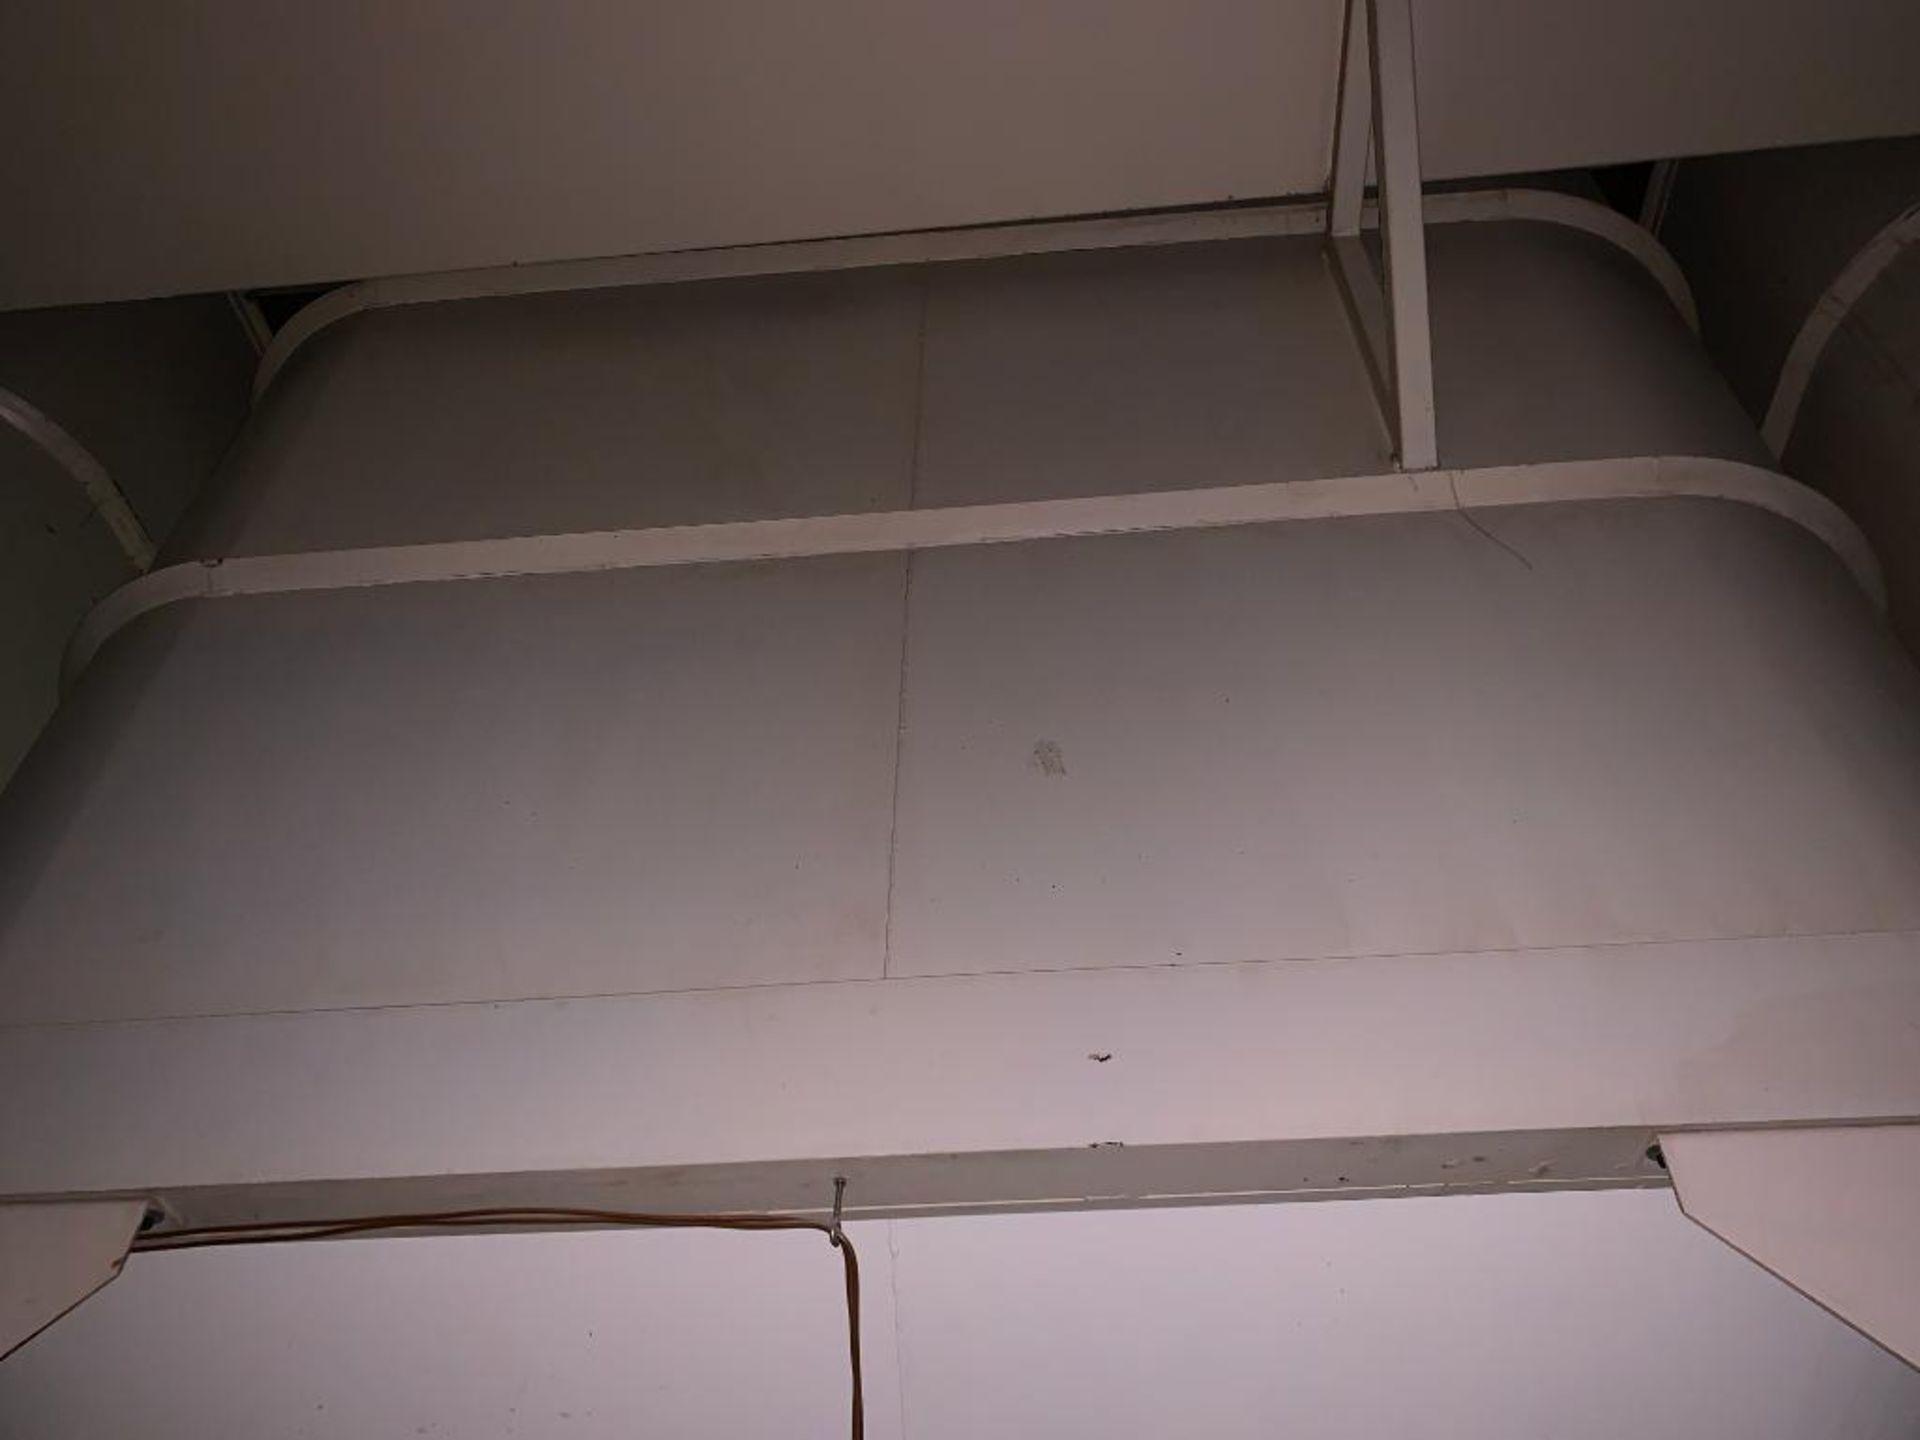 Aseeco mild steel cone bottom bulk storage bin - Image 22 of 23